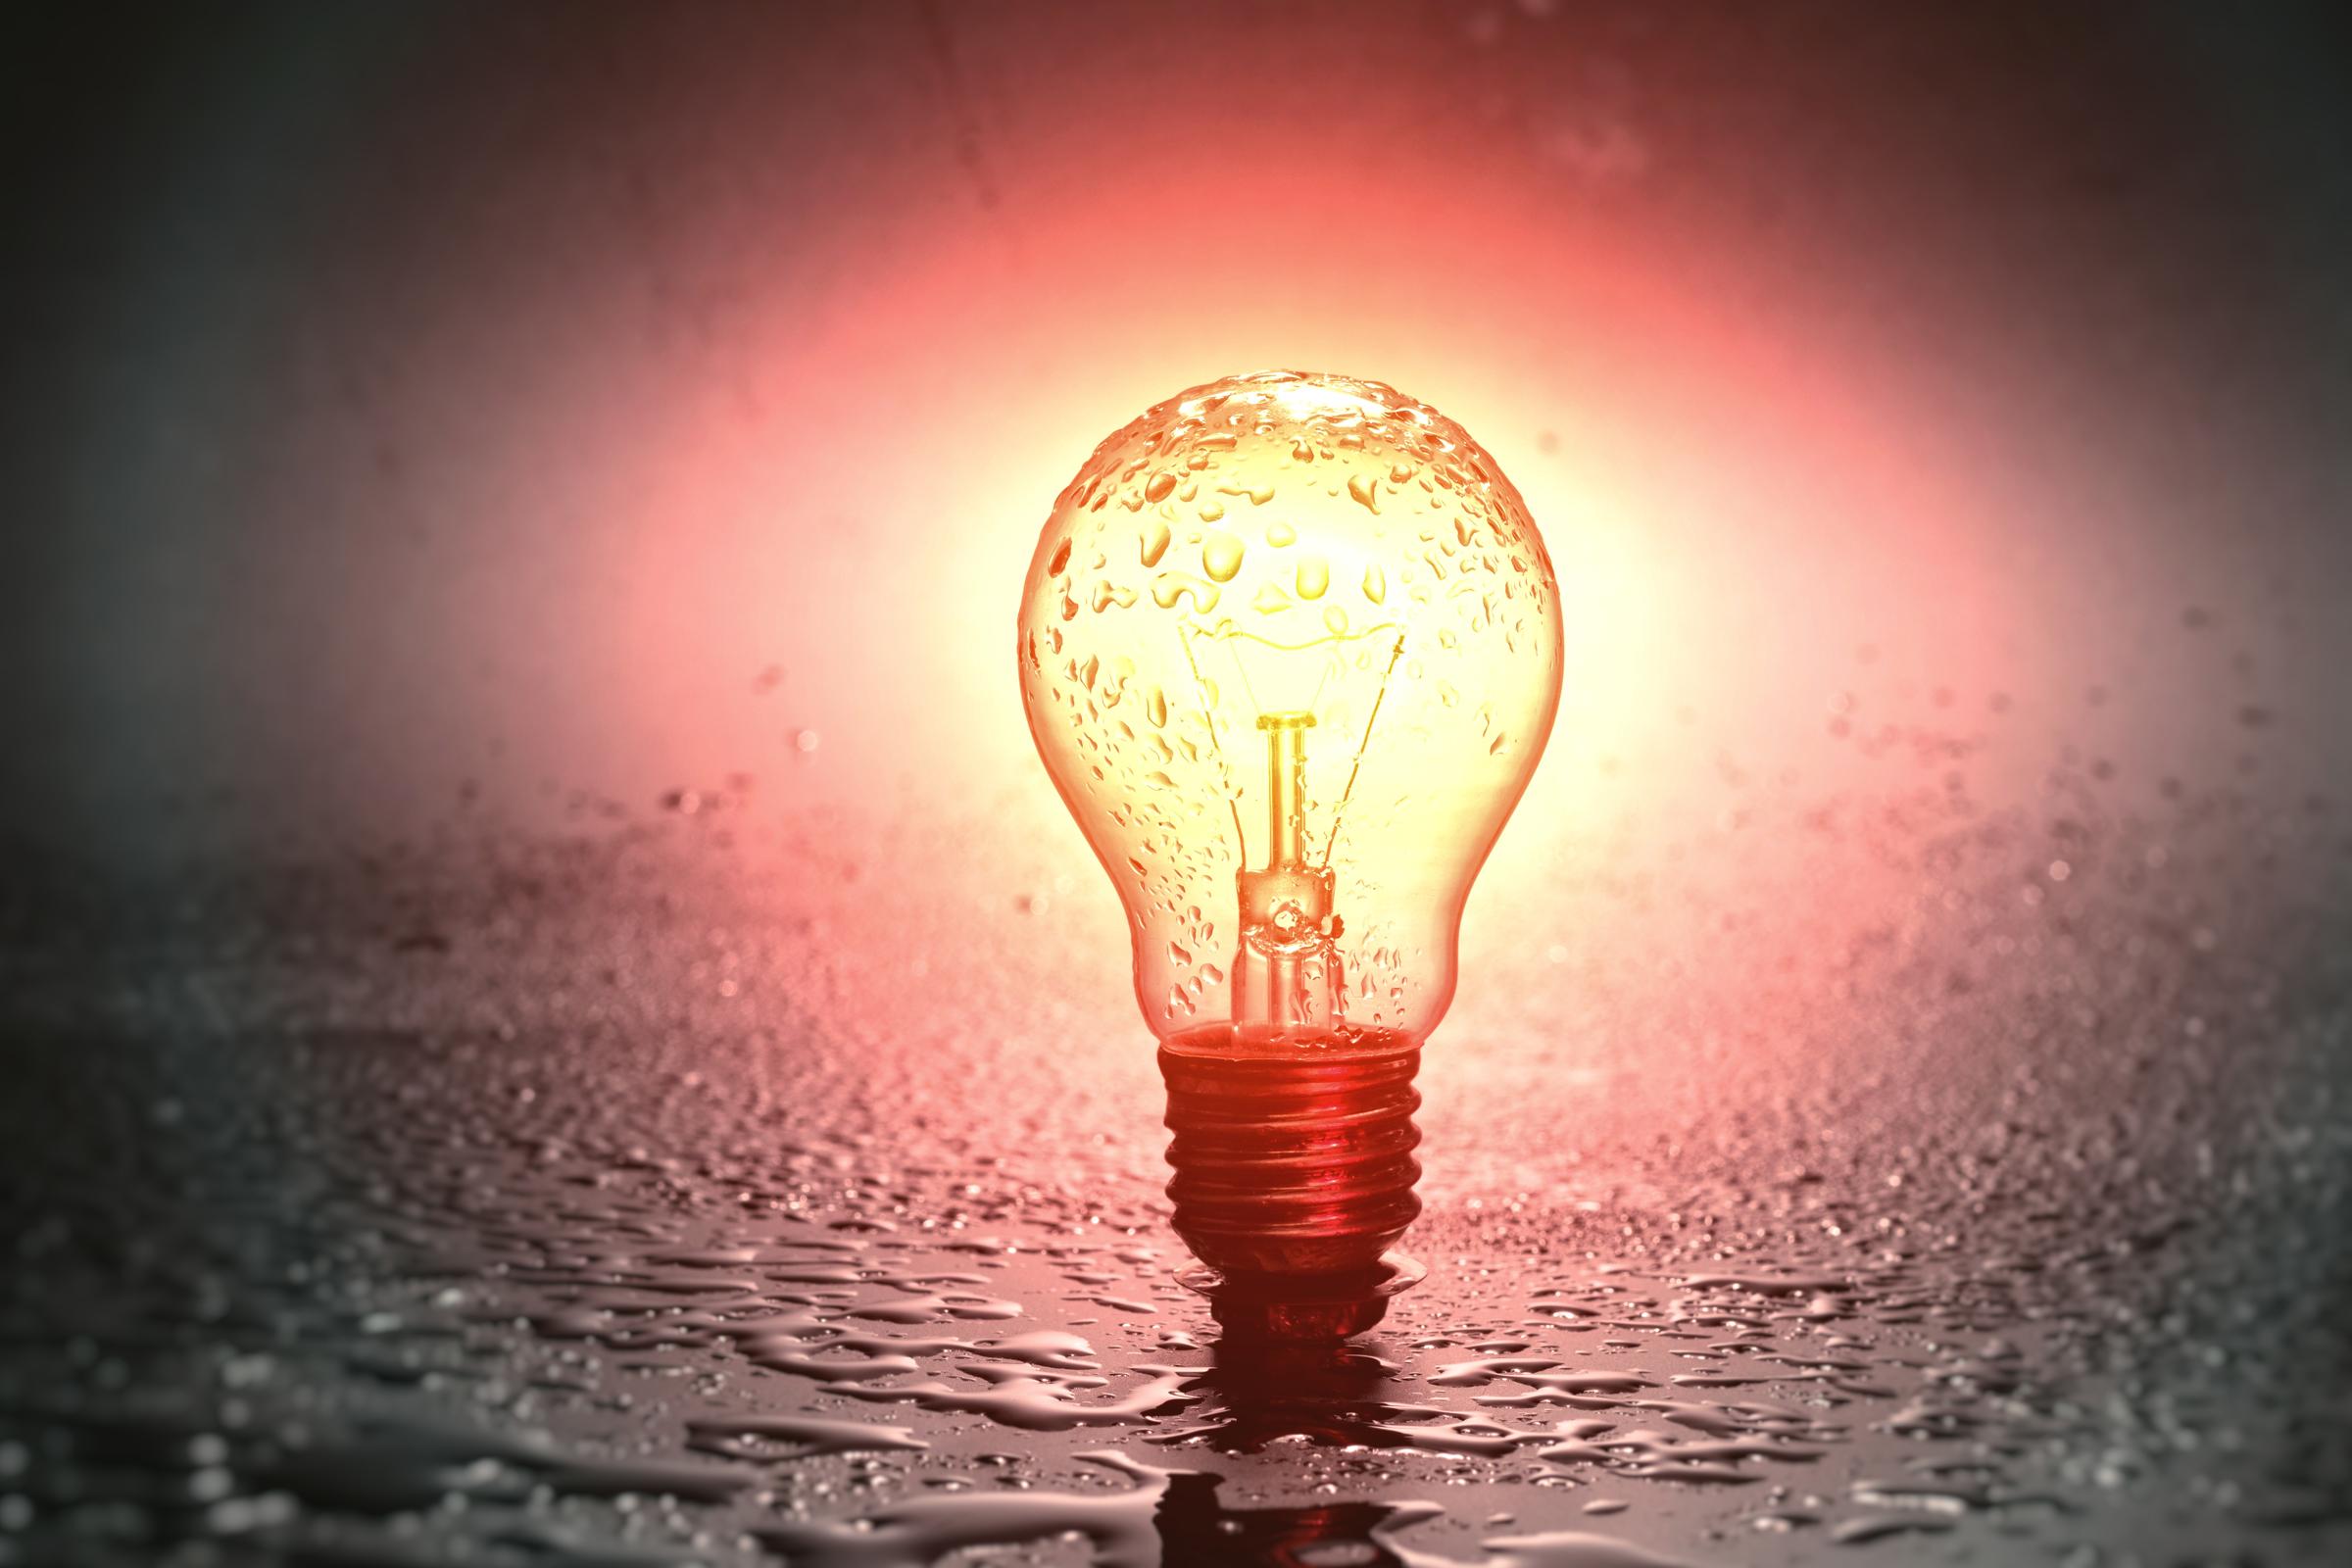 Isolated Light Bulb, App, Lightbulb, Networking, Network, HQ Photo